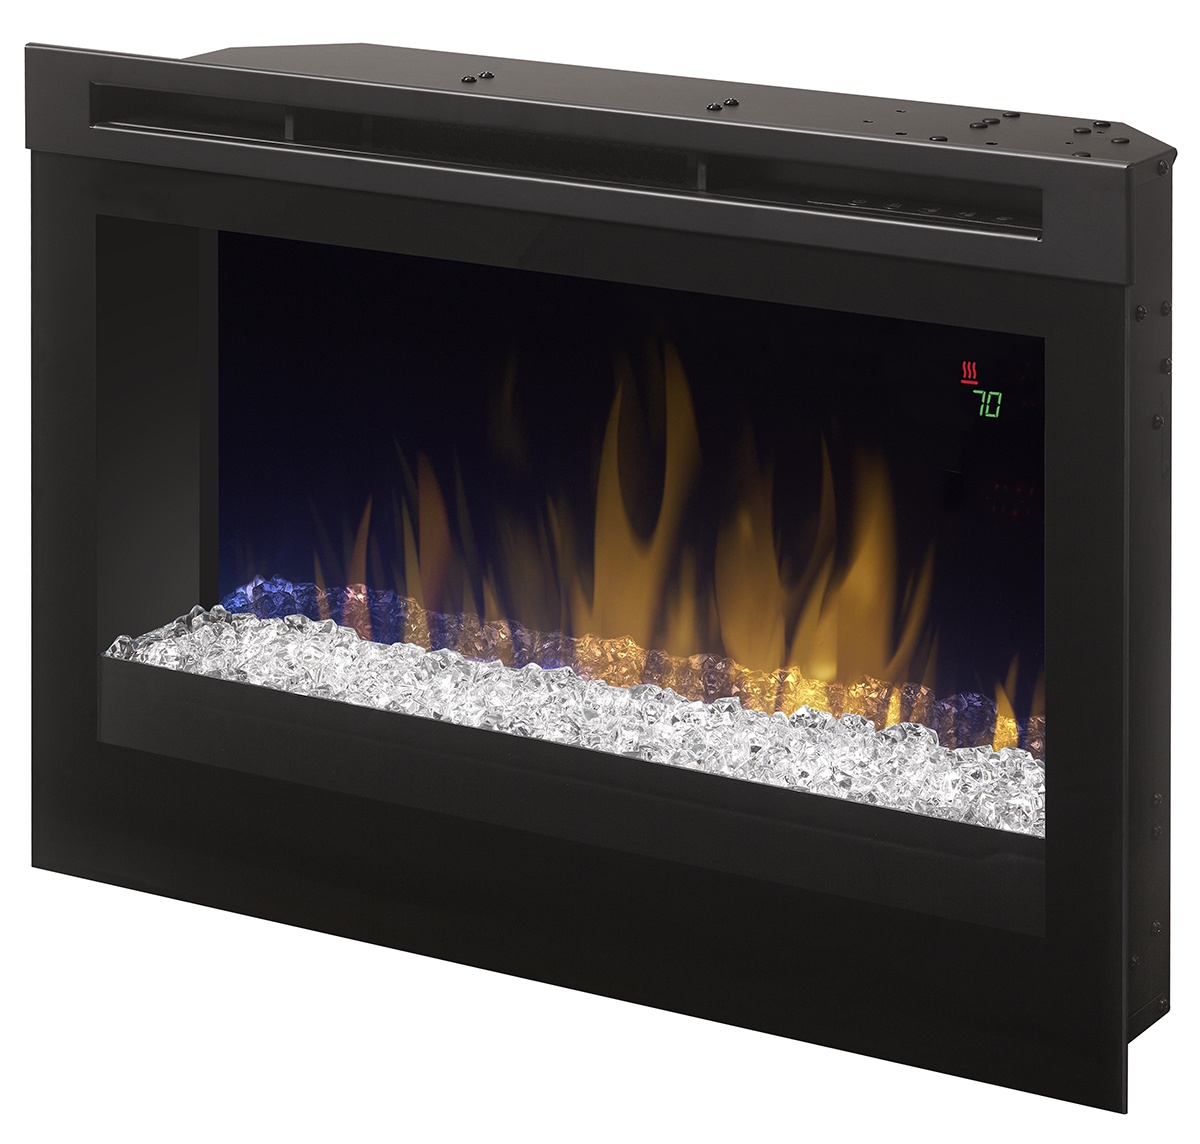 Dimplex 25 Dfr G Electric Fireplace Insert